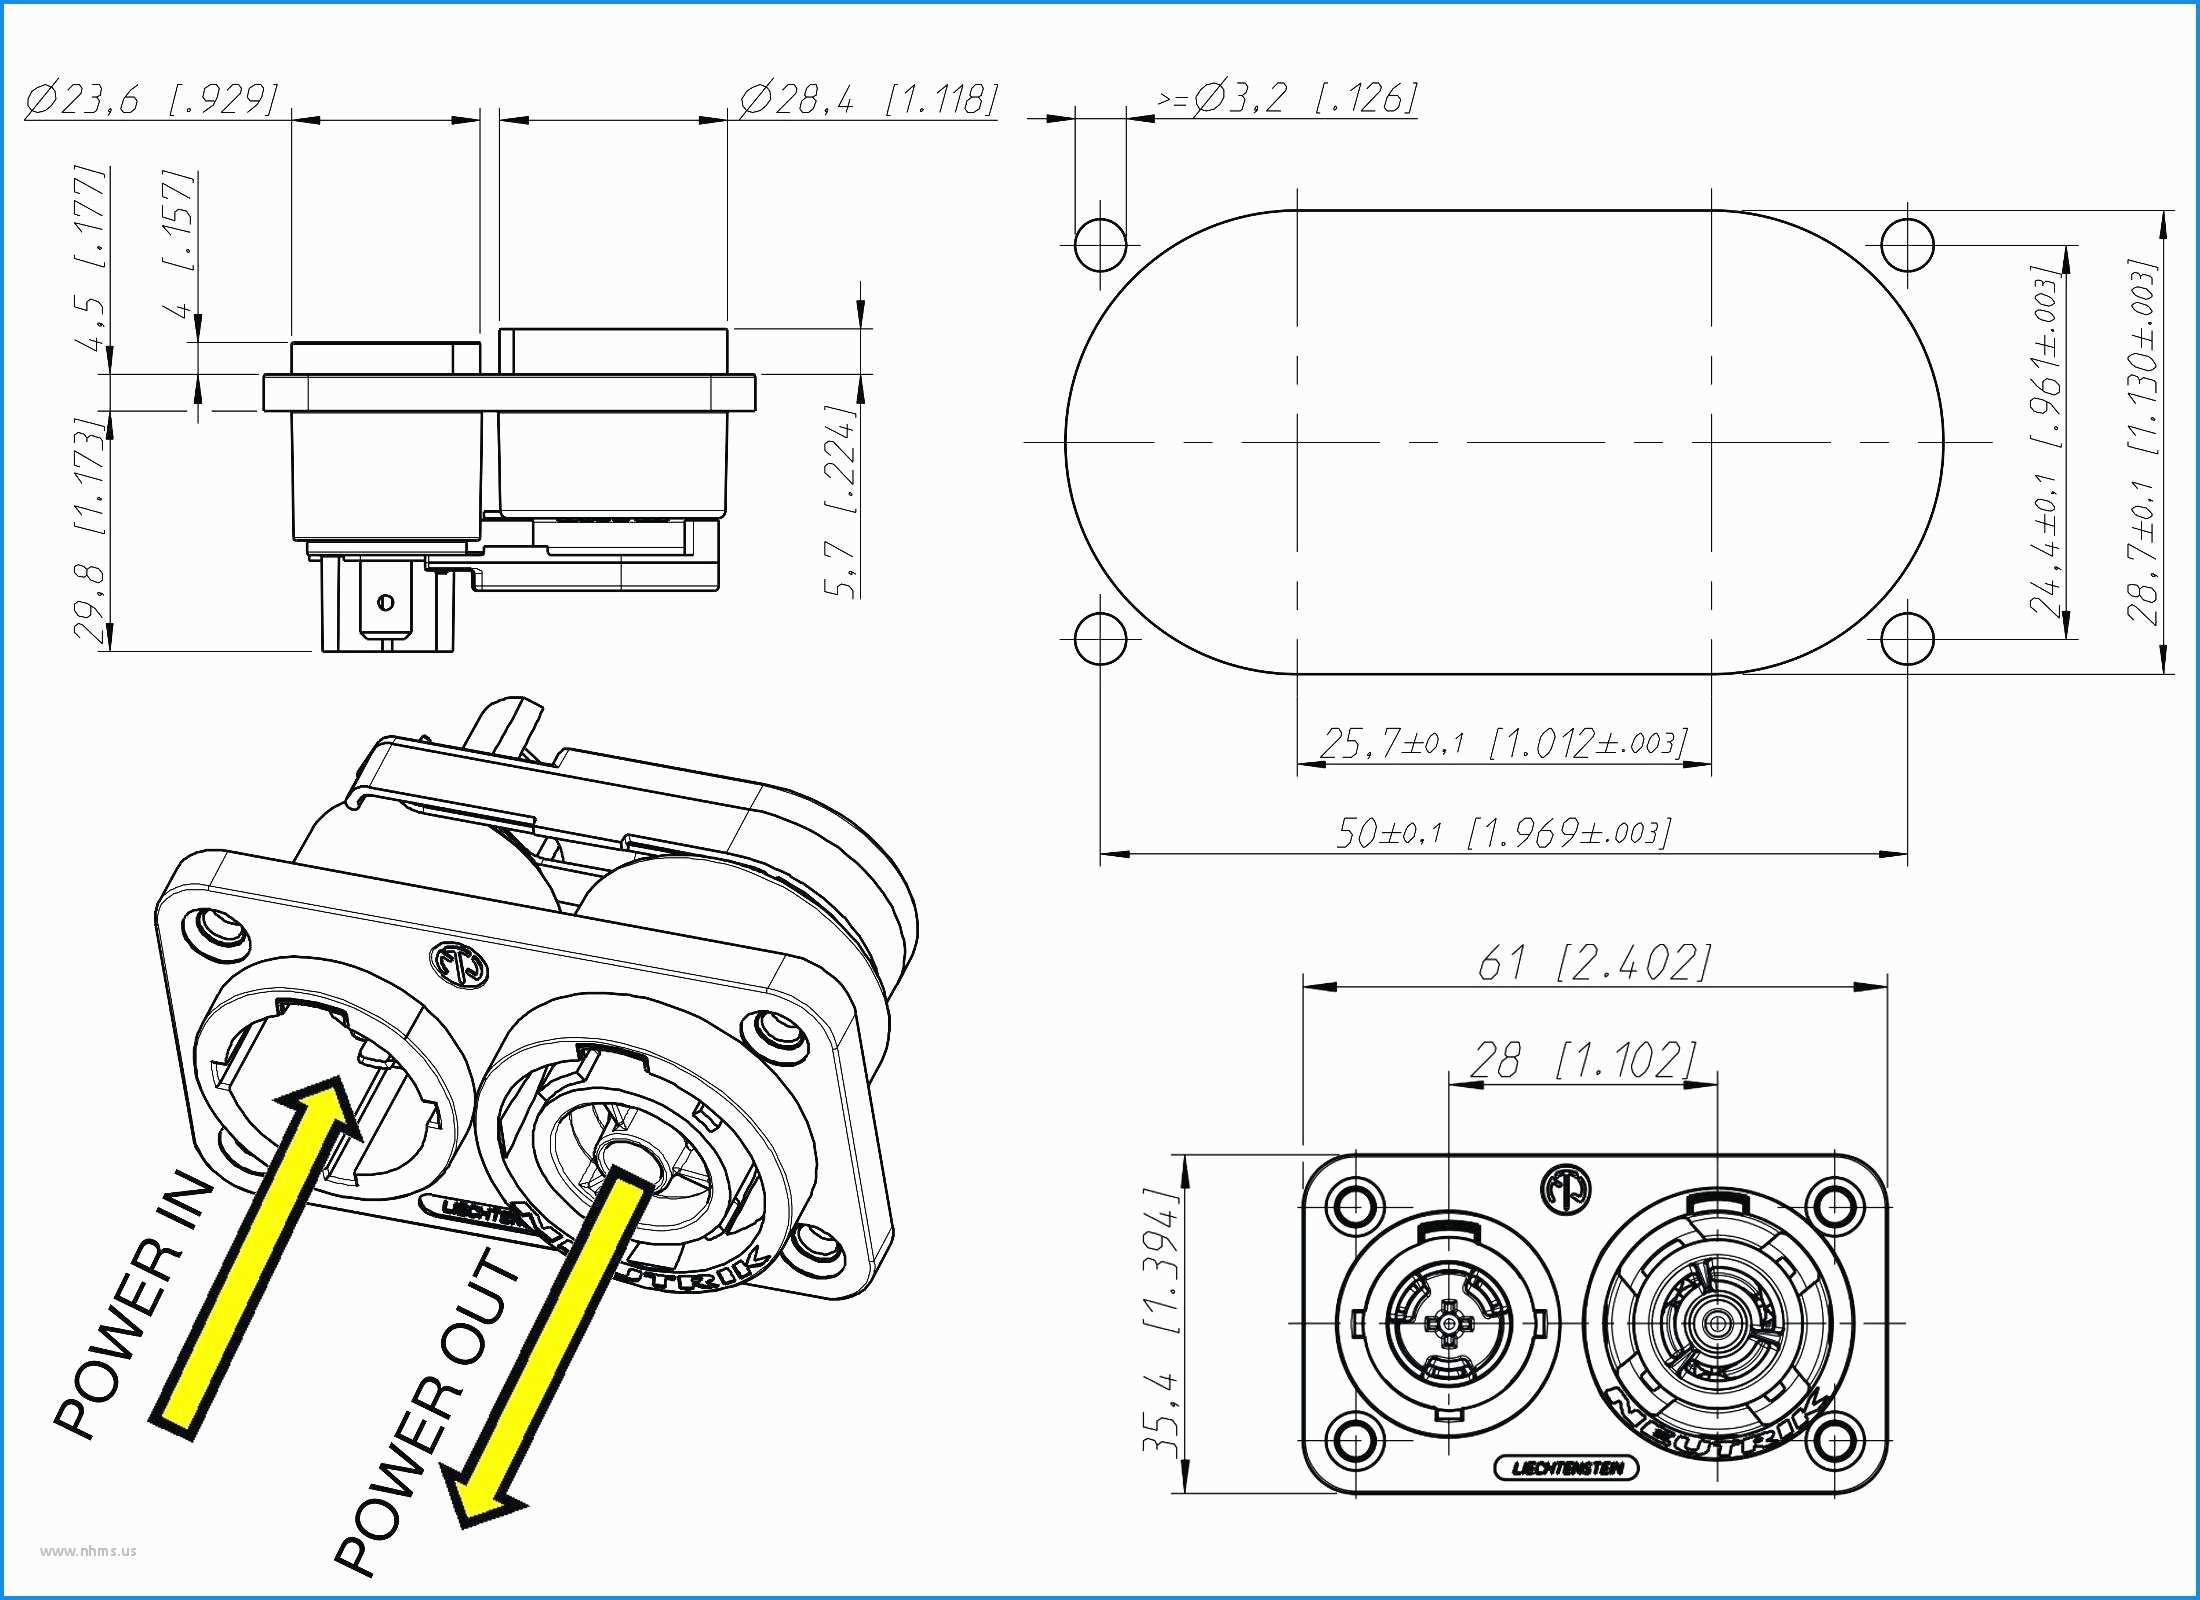 Wiring Diagram Software Open Source Uncomplicated Neutrik Speakon - Wiring Diagram Software